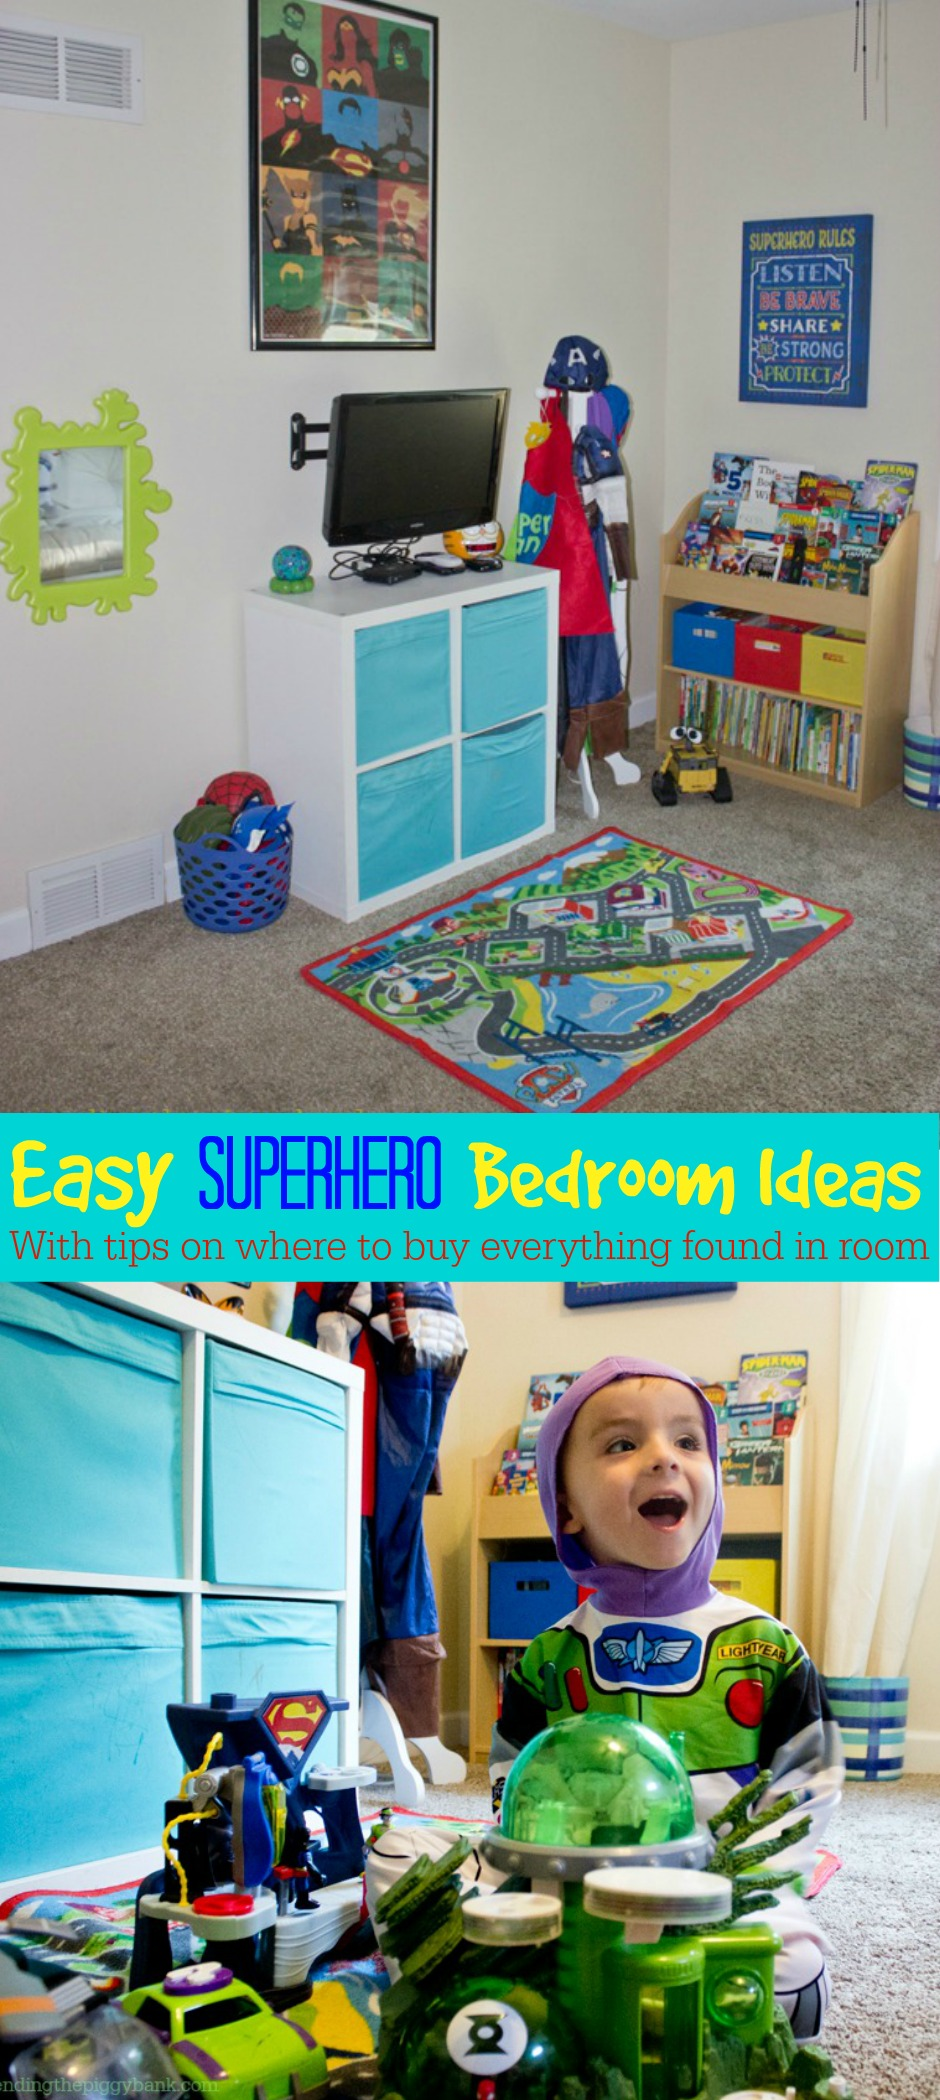 Easy Superhero Bedroom Ideas